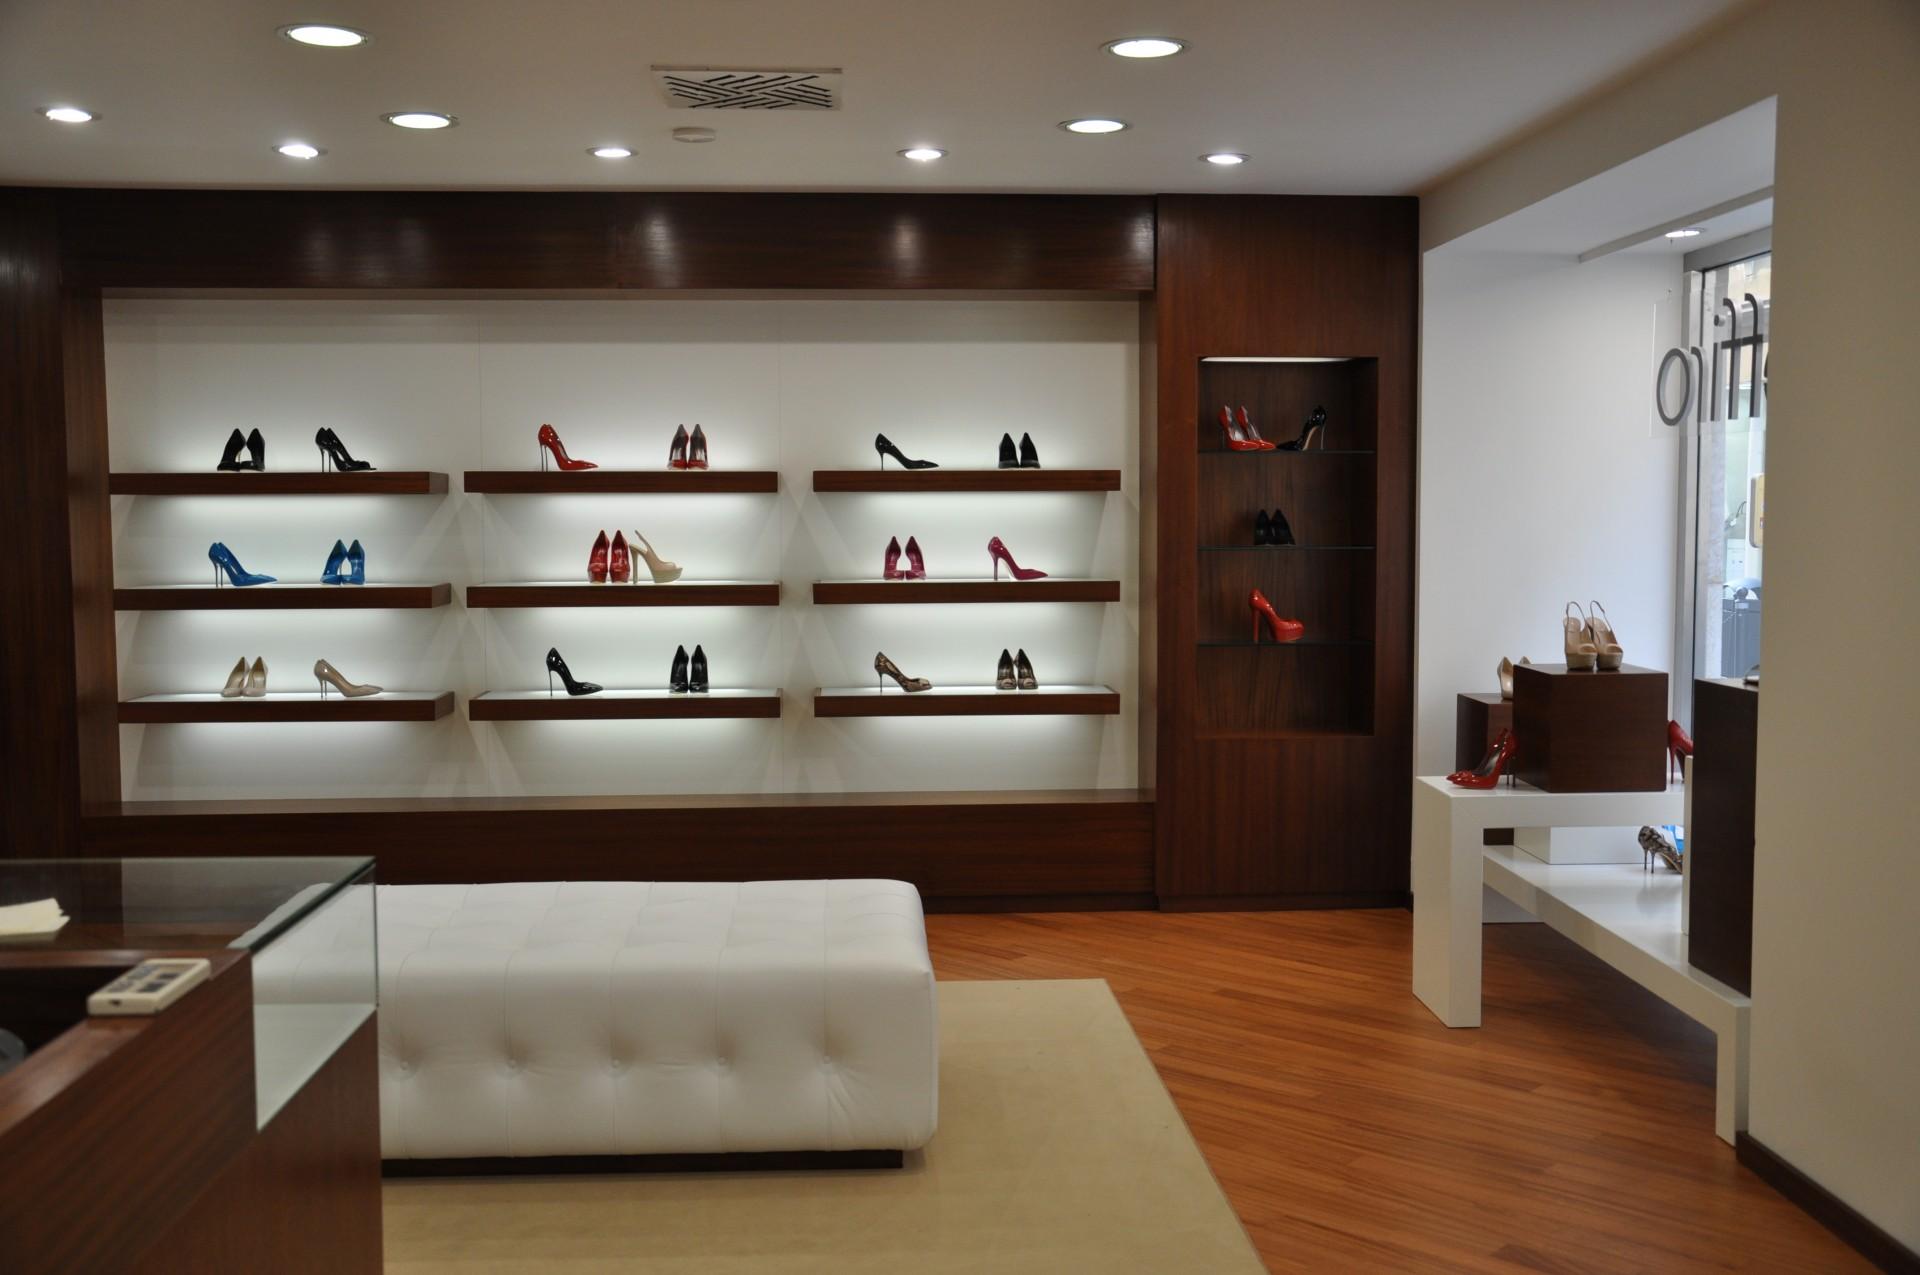 allestimento negozio scarpe tr81 regardsdefemmes